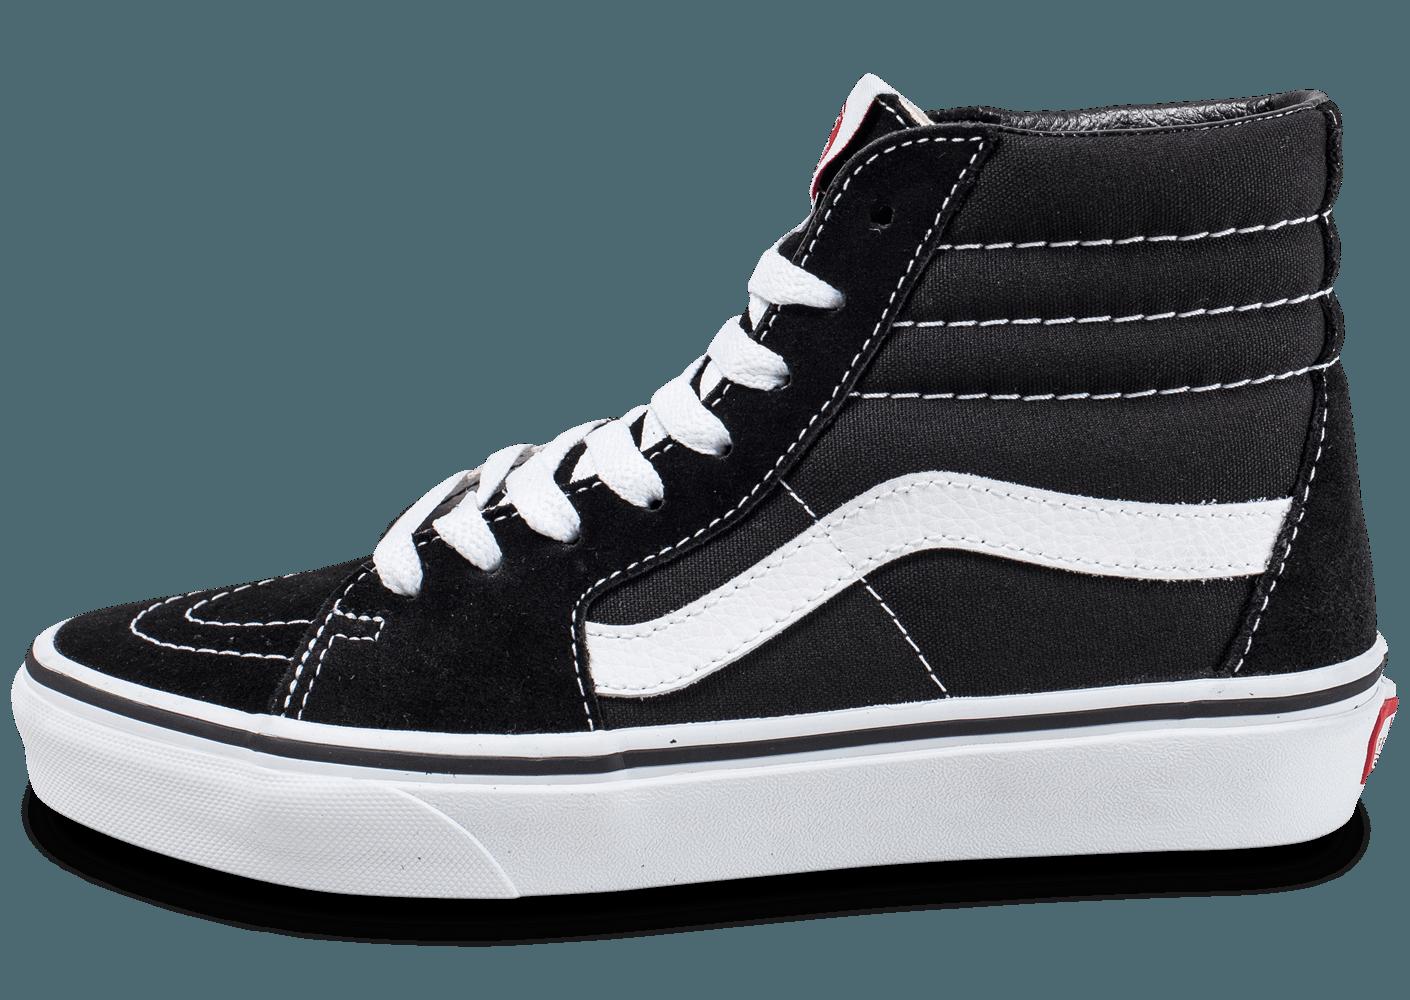 vans shoes png images free download vans shoes png images free download